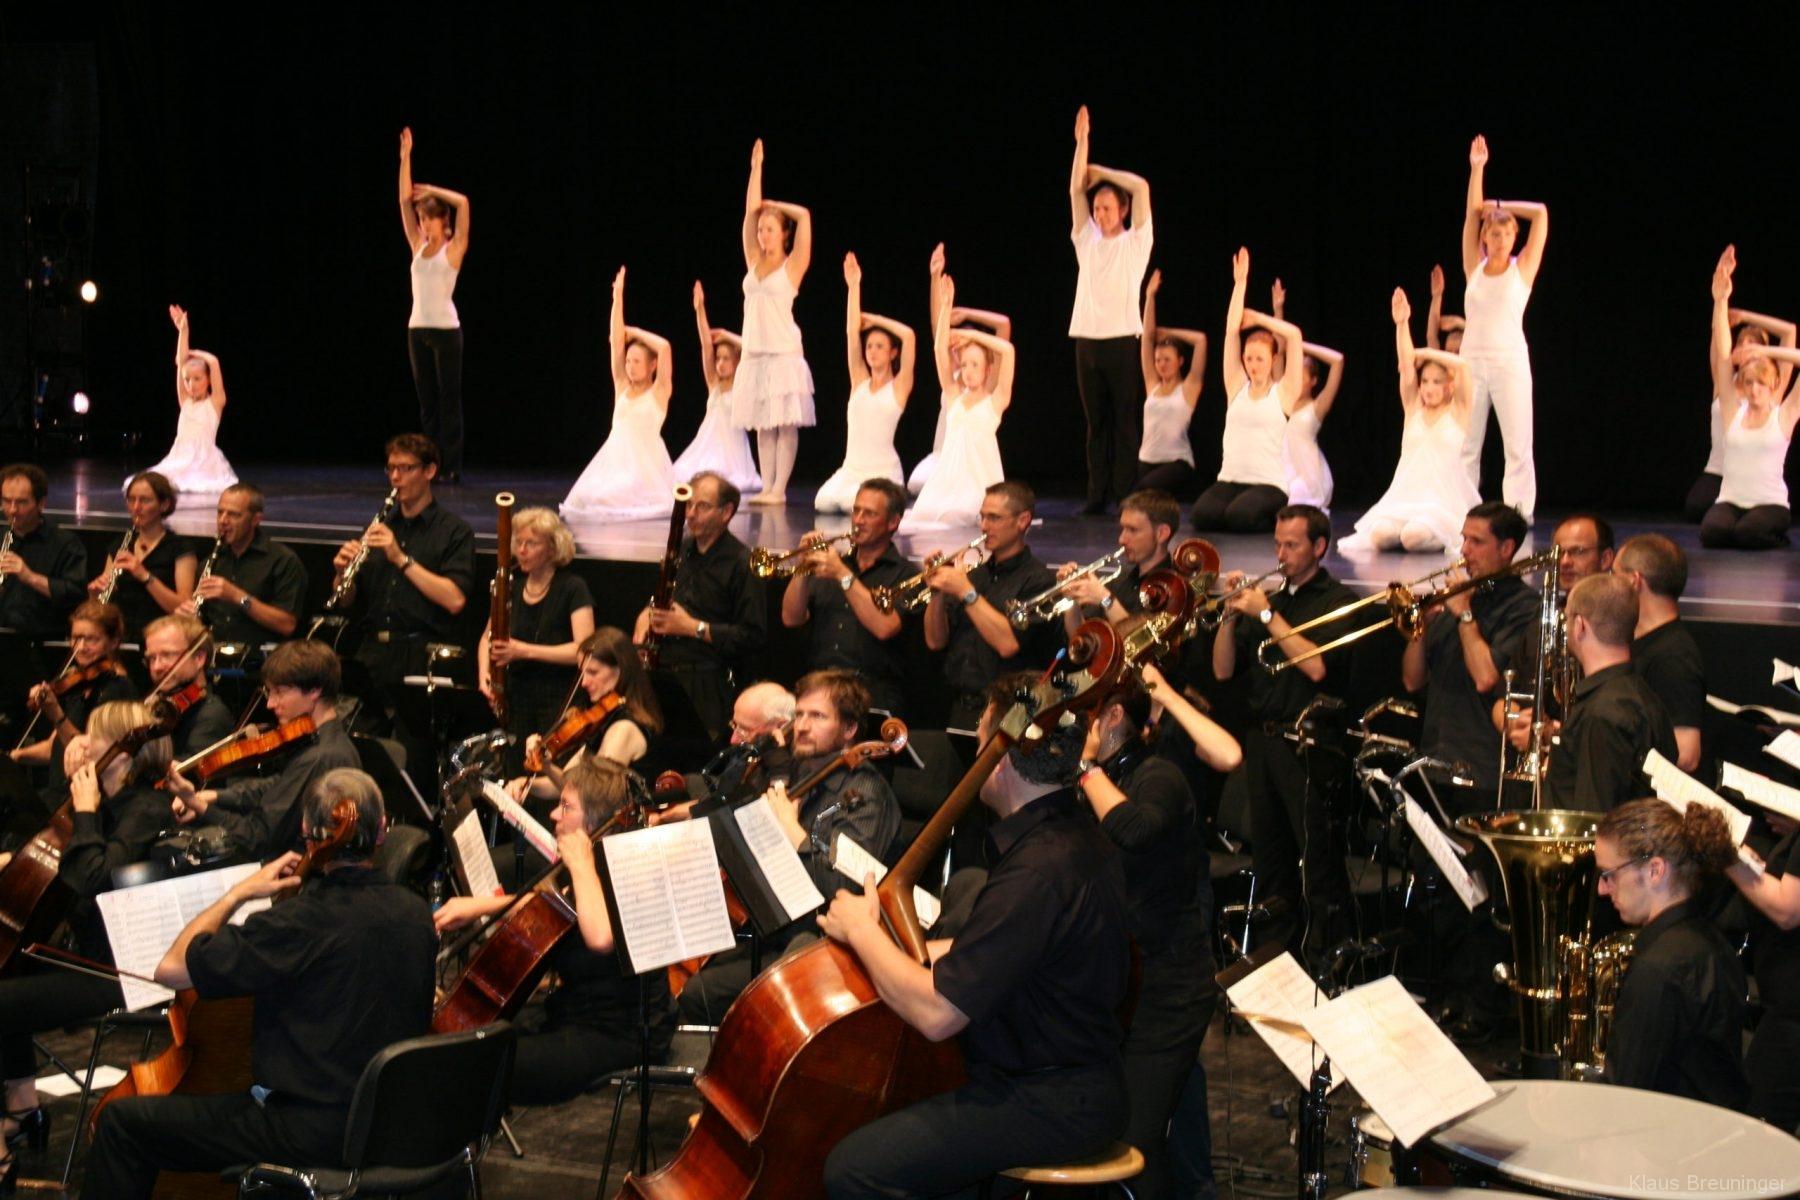 20090625_SoC_DancingInConcert_Fotoshooting_14-scaled